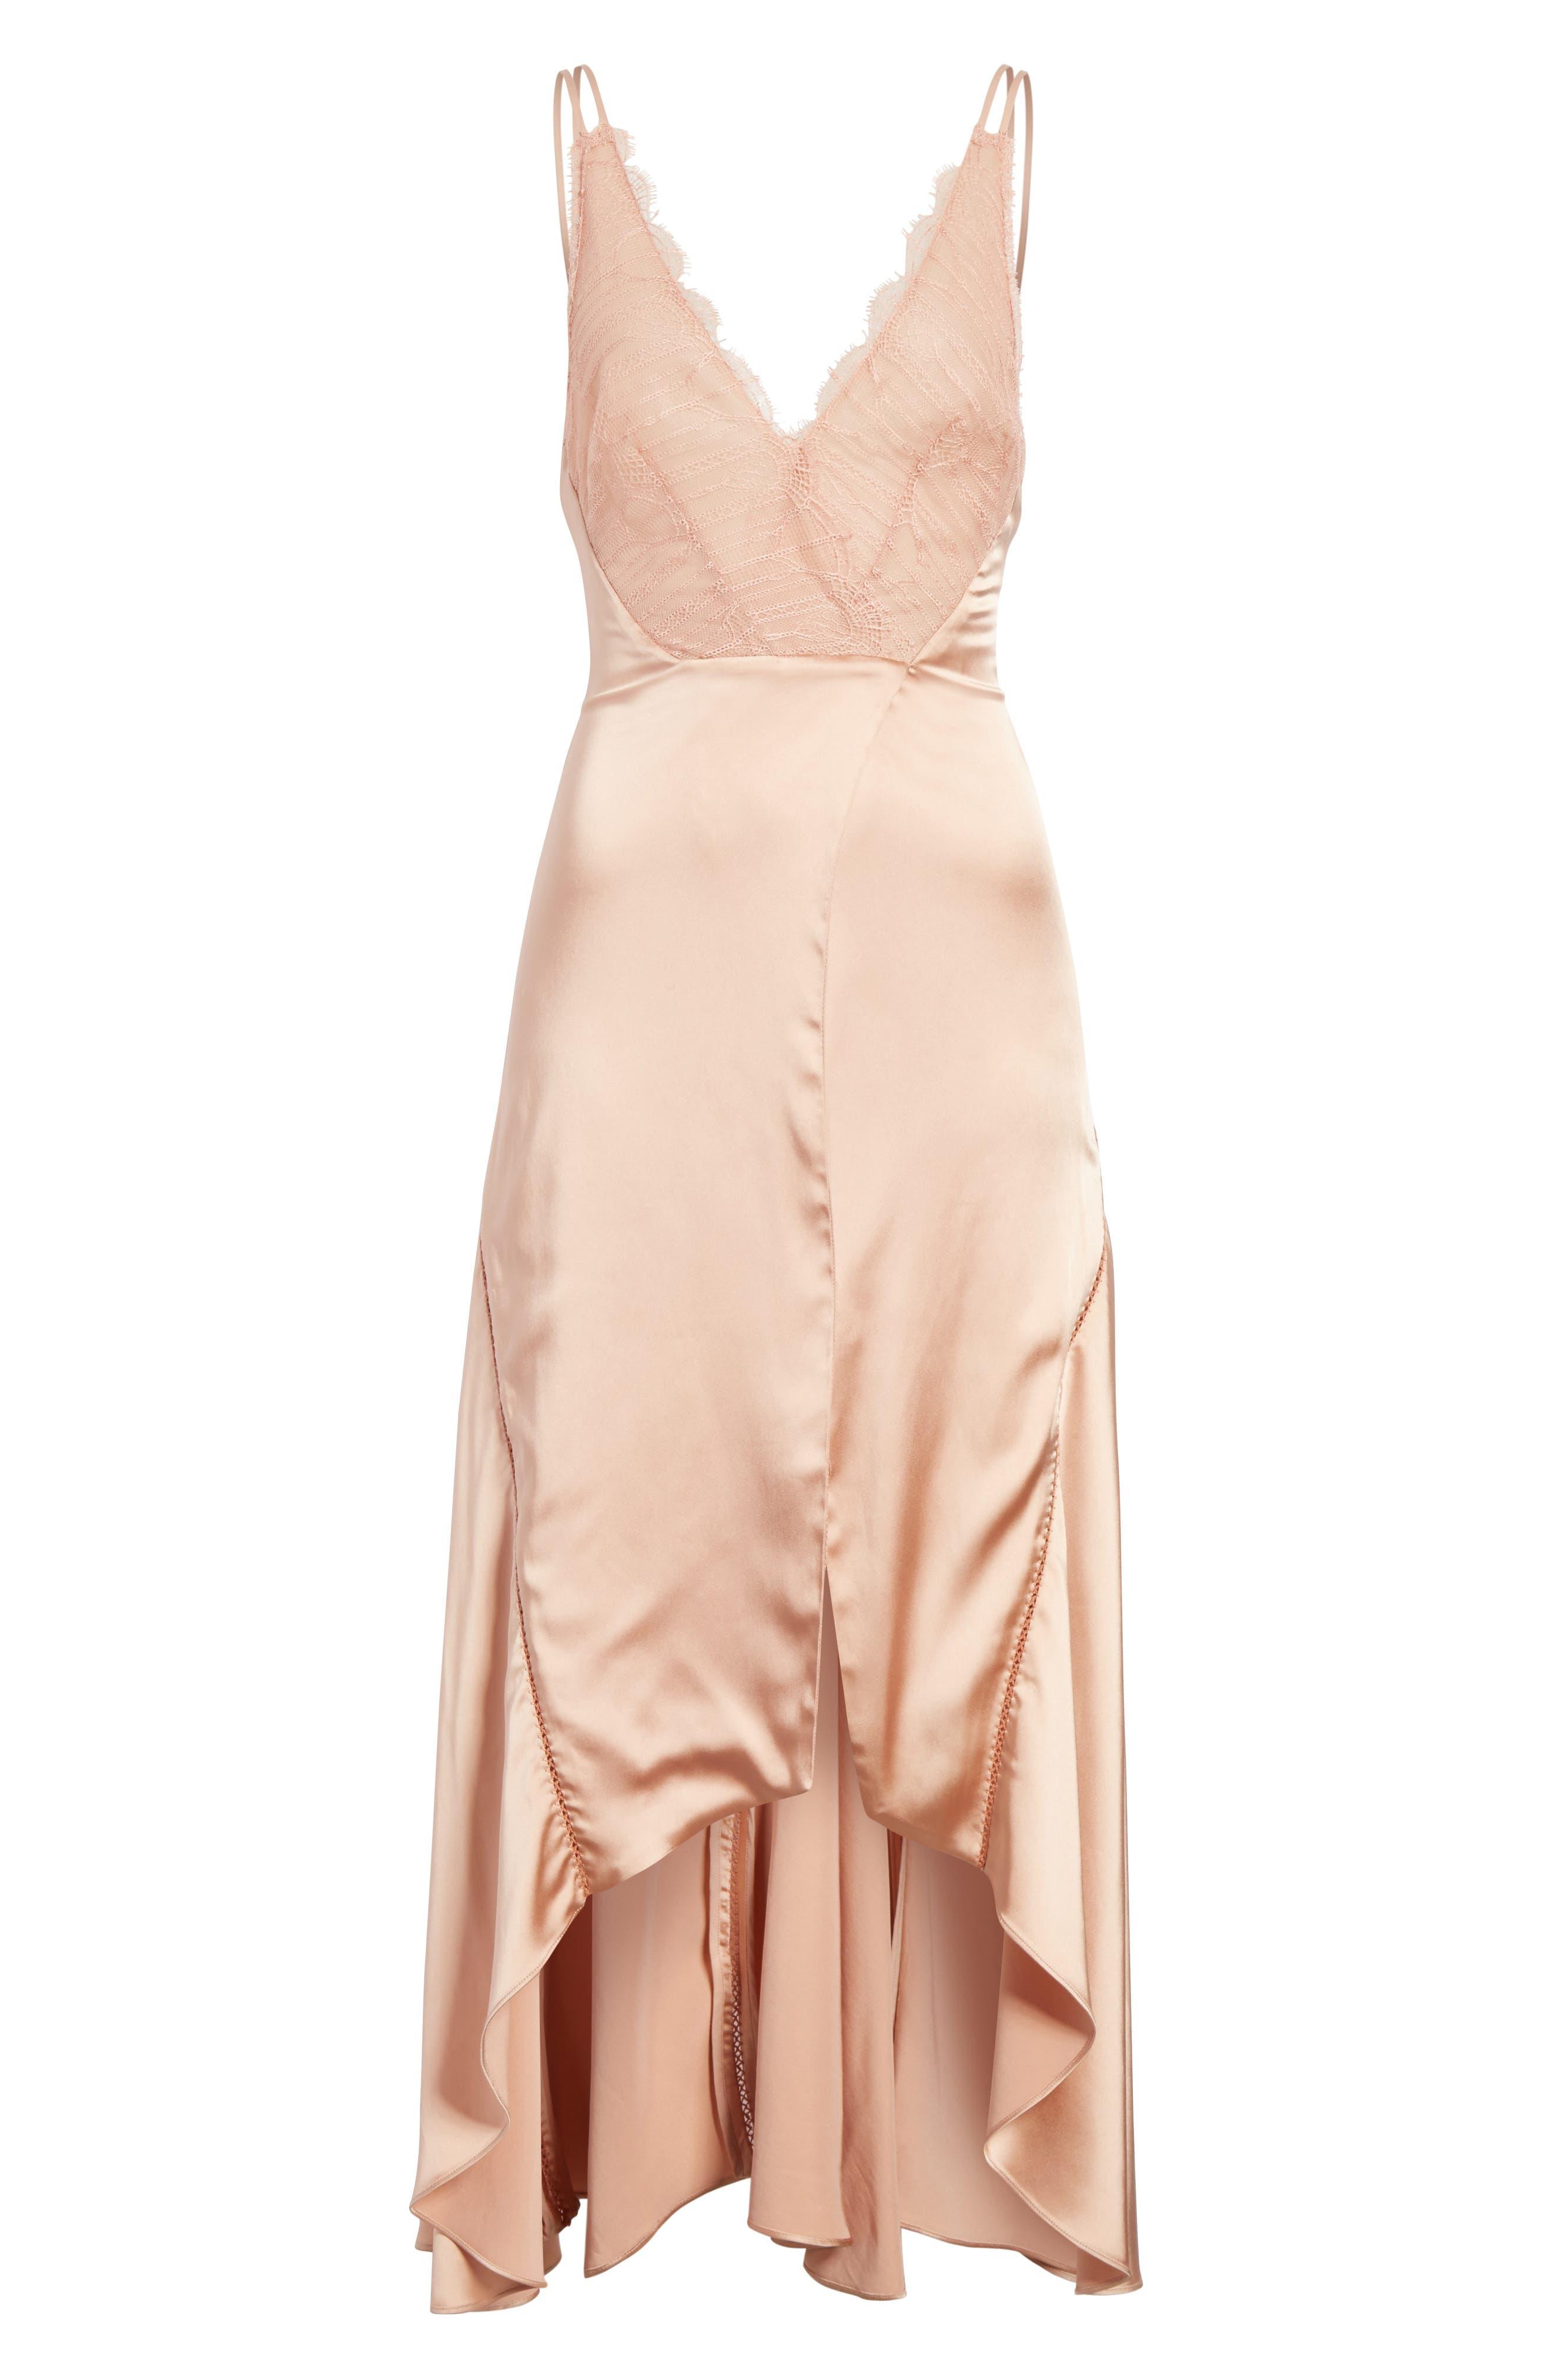 Mixed Trim Satin Handkerchief Dress,                             Alternate thumbnail 6, color,                             241